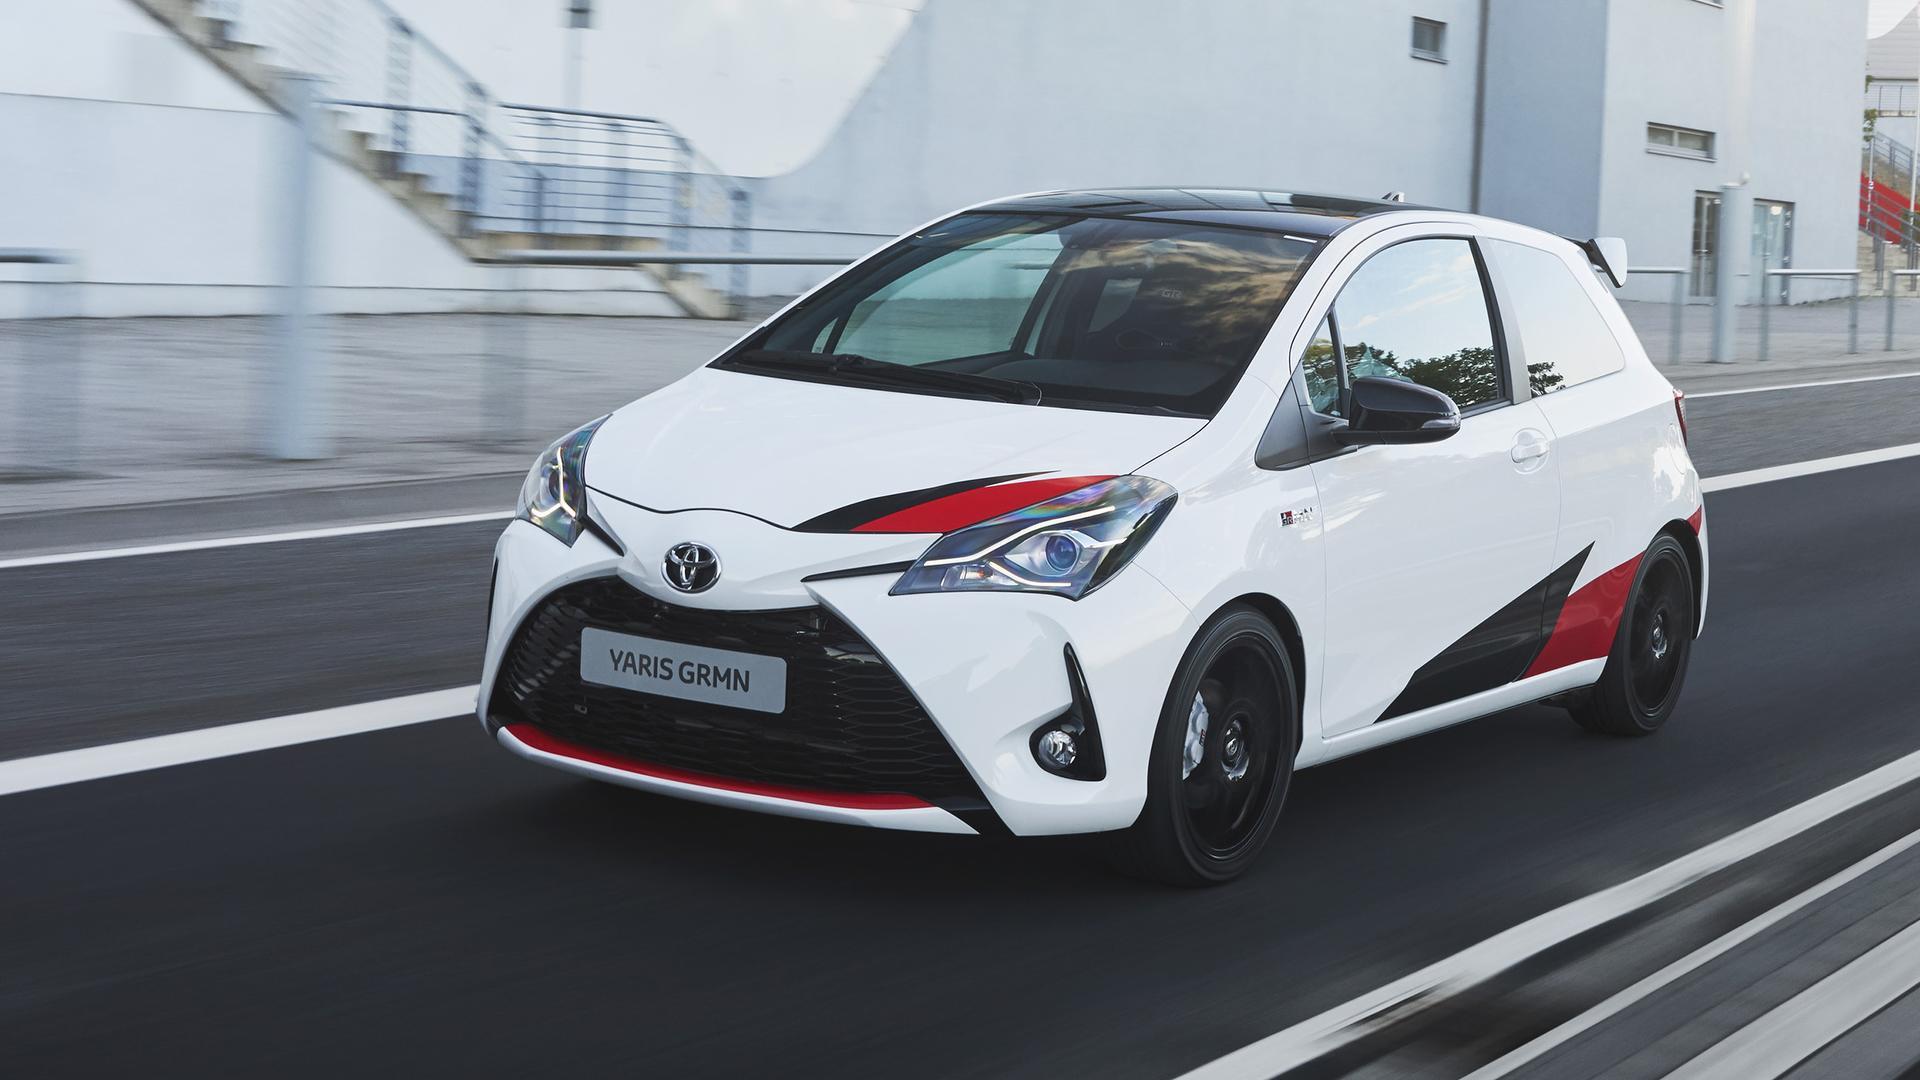 Toyota Yaris Grmn >> Toyota Yaris Grmn News And Reviews Motor1 Com